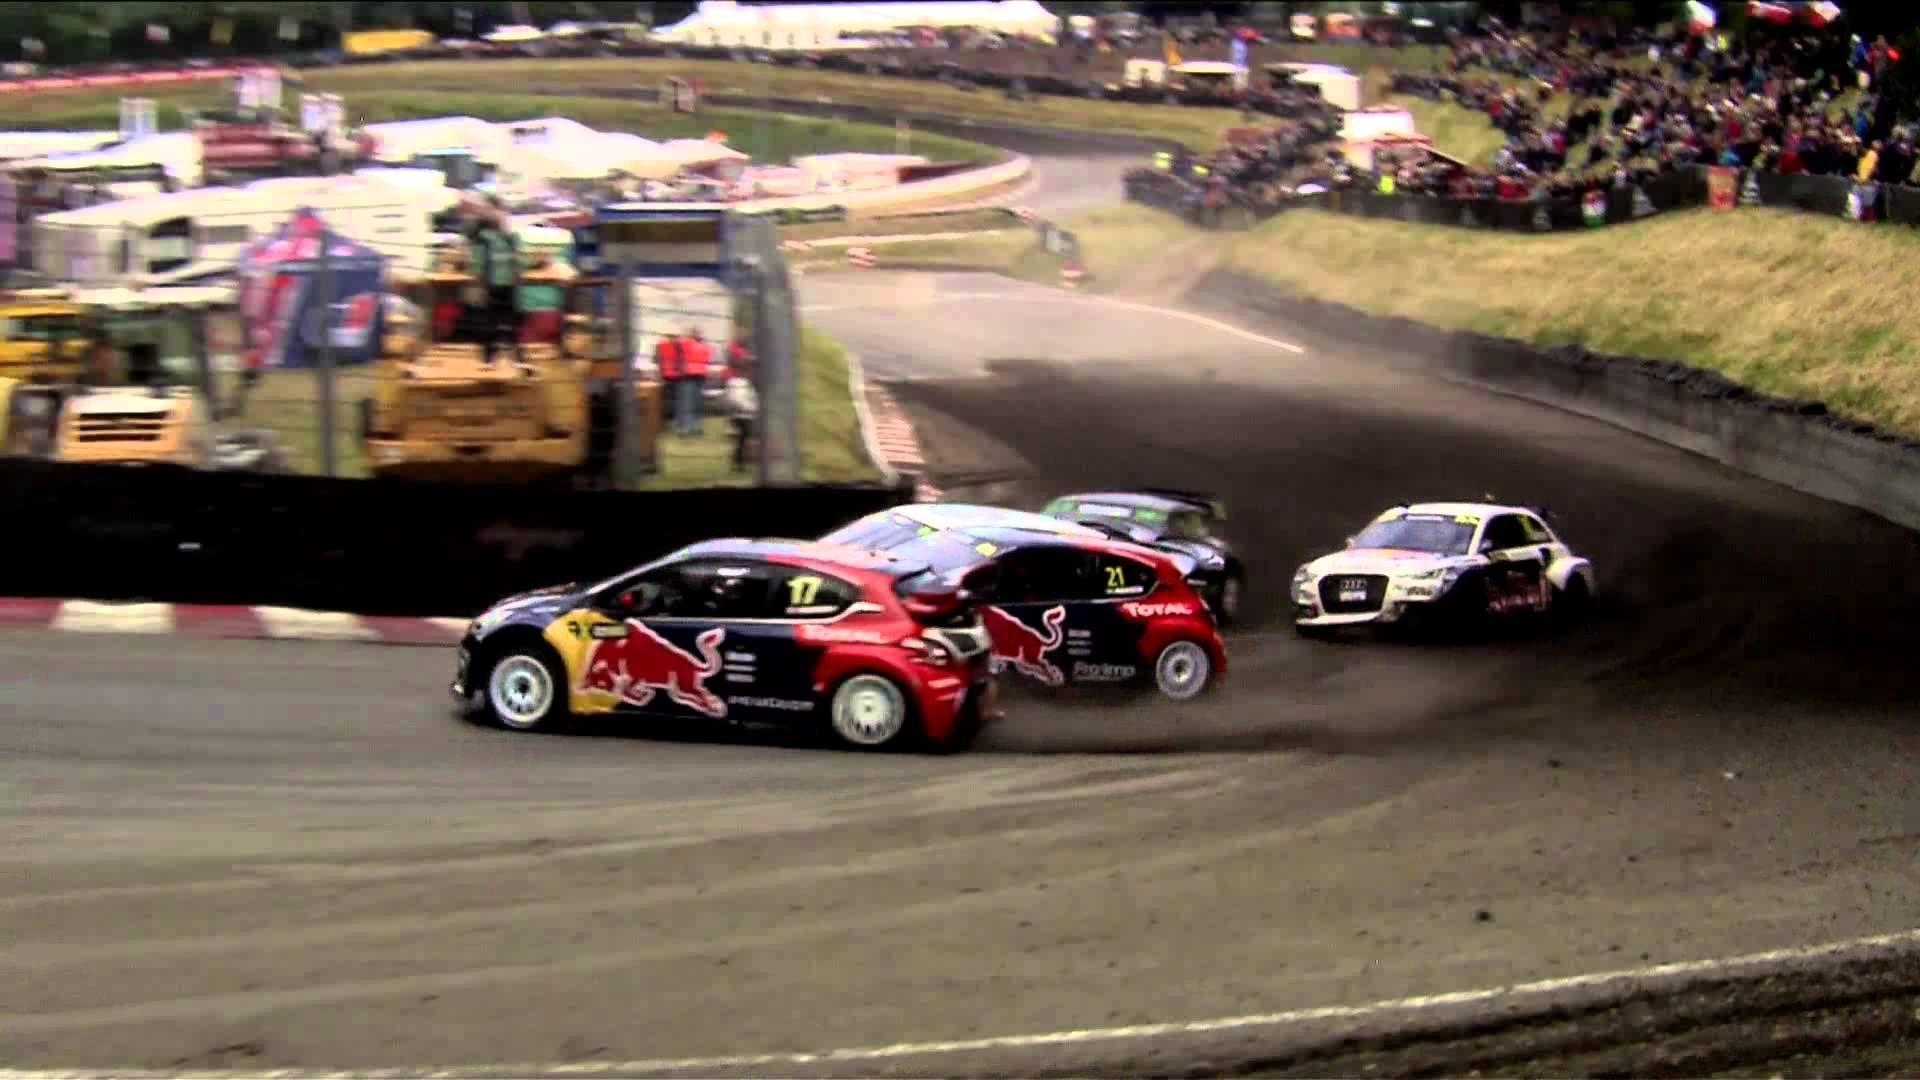 LOHEAC RX - SUPERCAR H2 R1 - FIA WORLD RALLYCROSS CHAMPIONSHIP ...